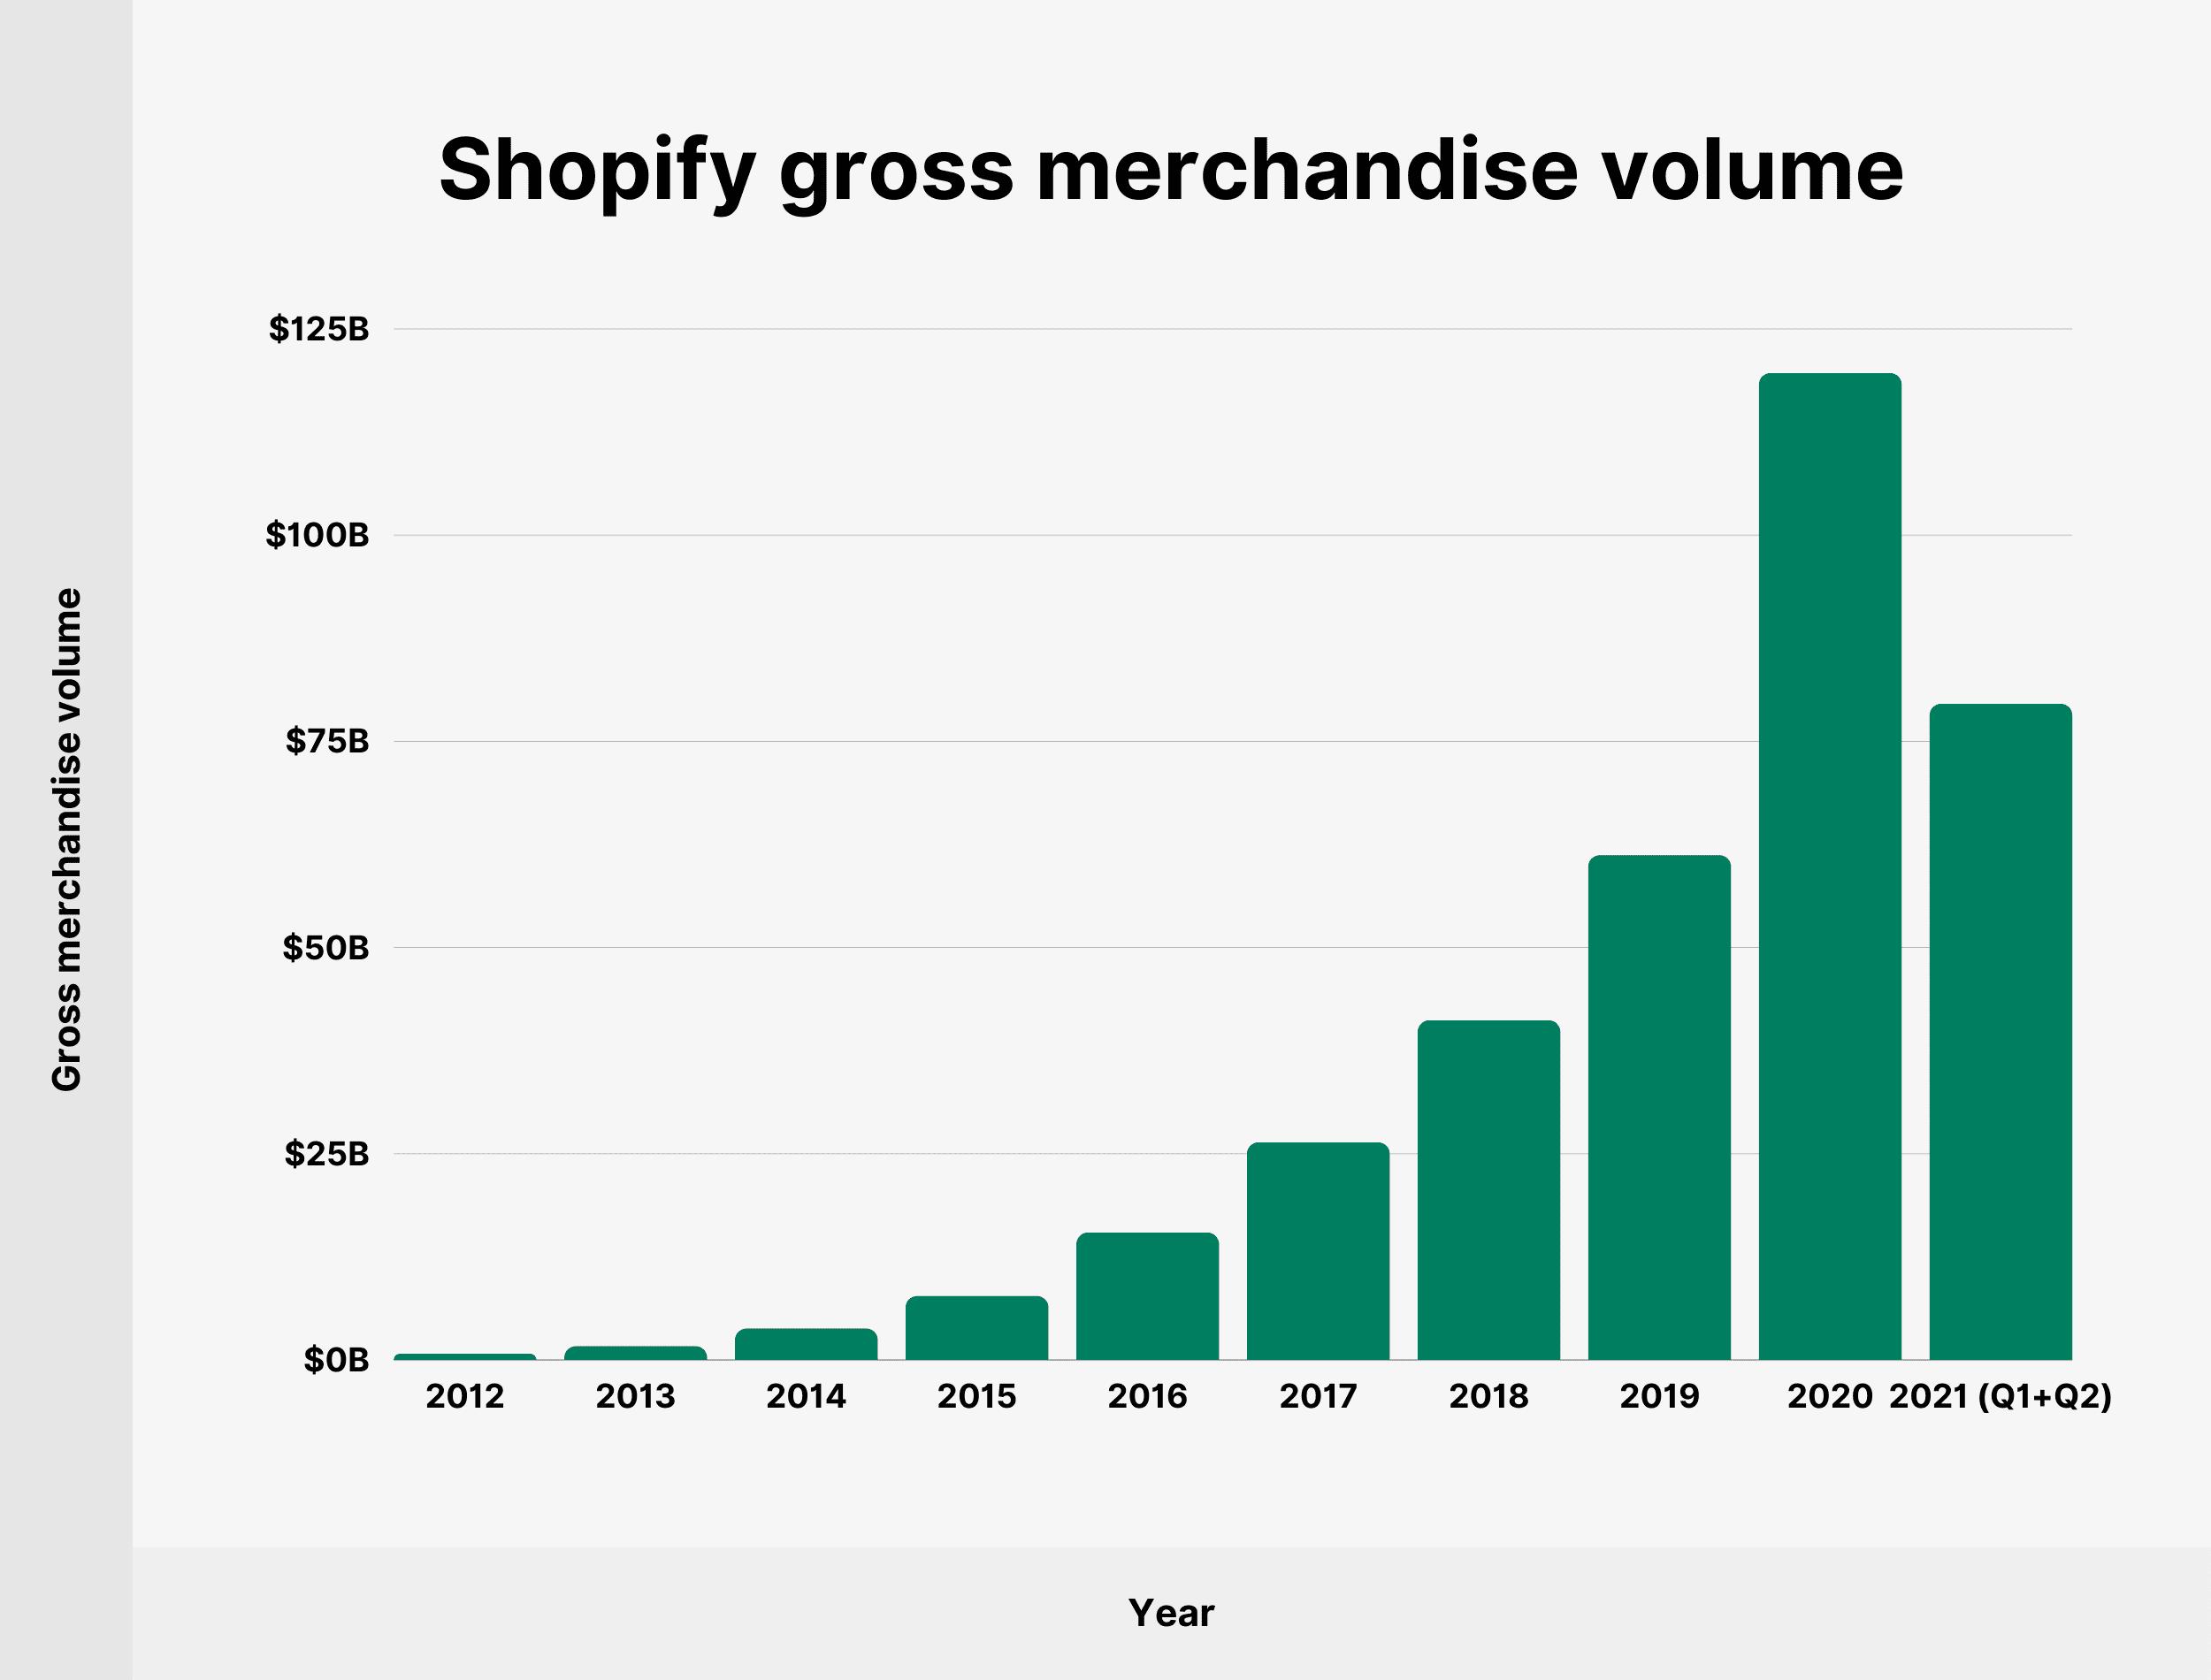 Shopify gross merchandise volume